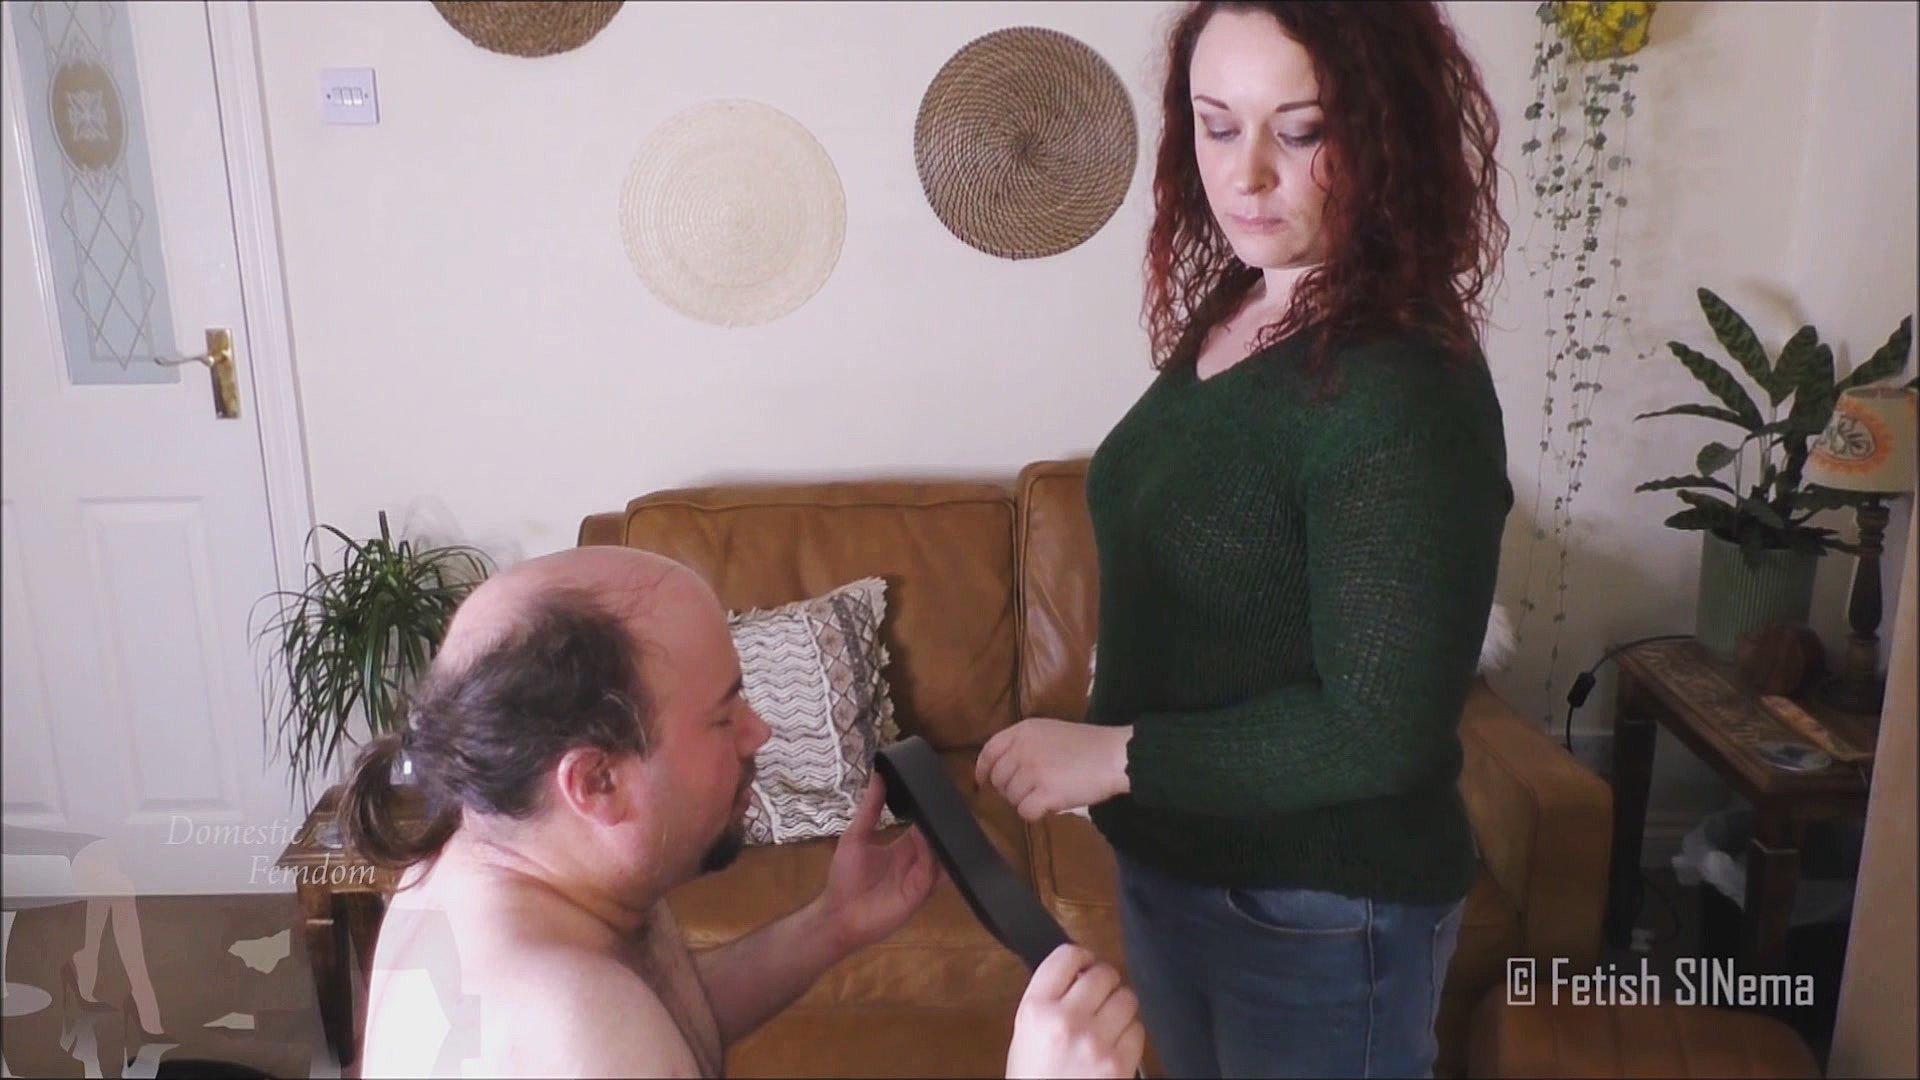 pervertneighbour3 - Pervert Neighbour Painstakingly Punished